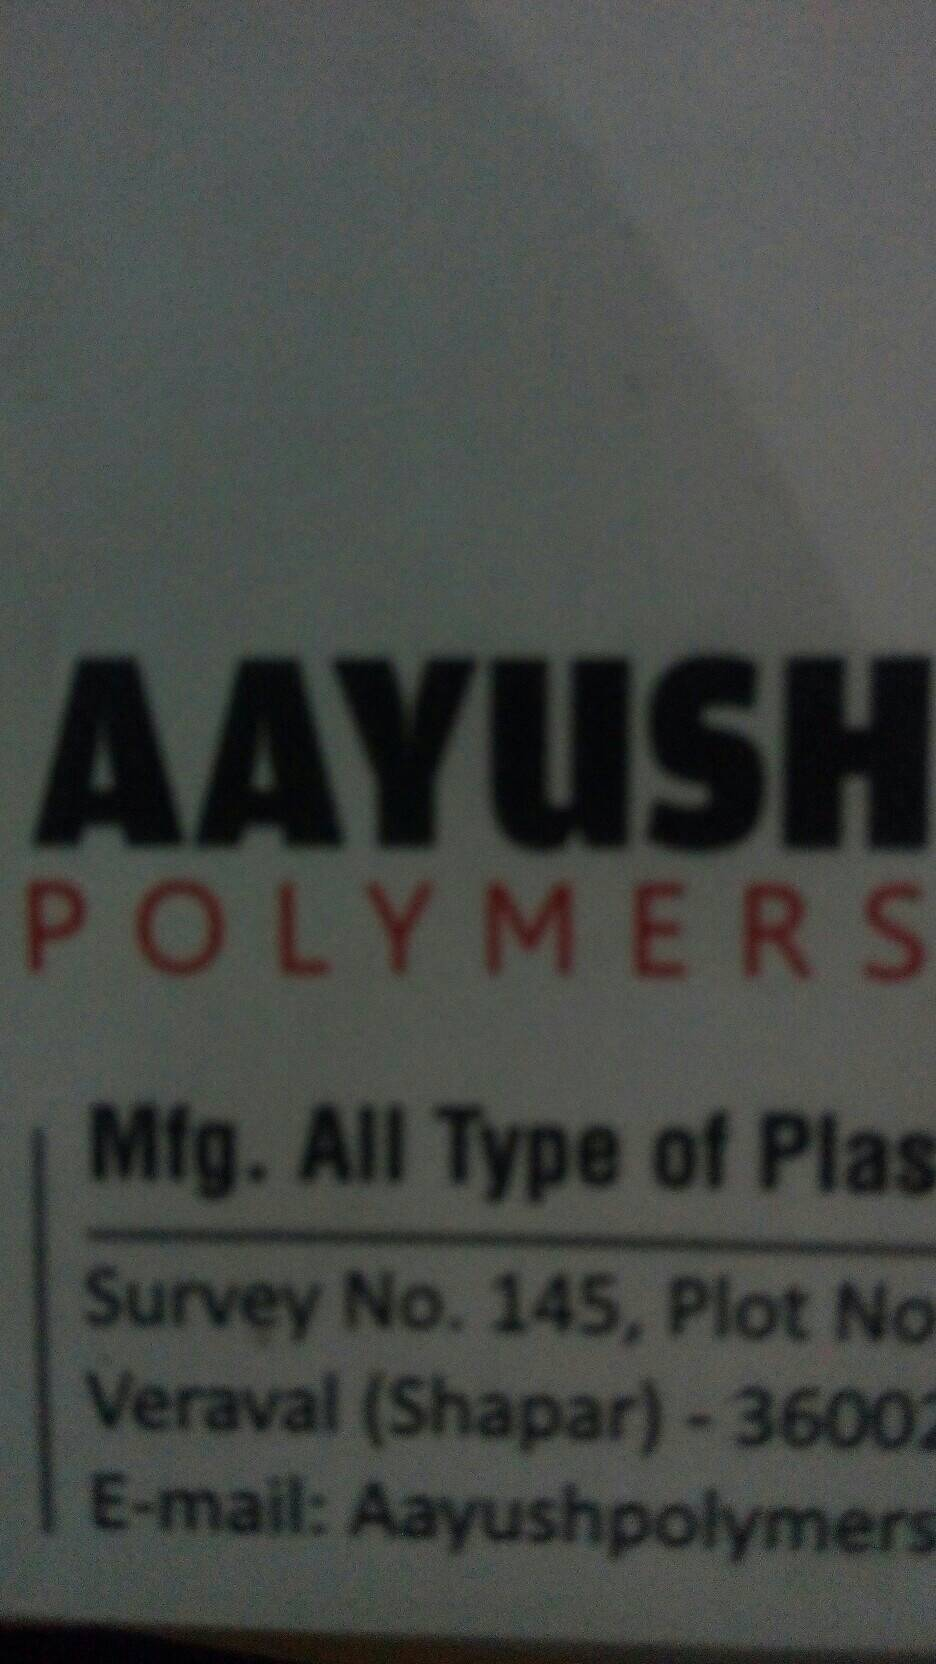 Aayushi Polymers